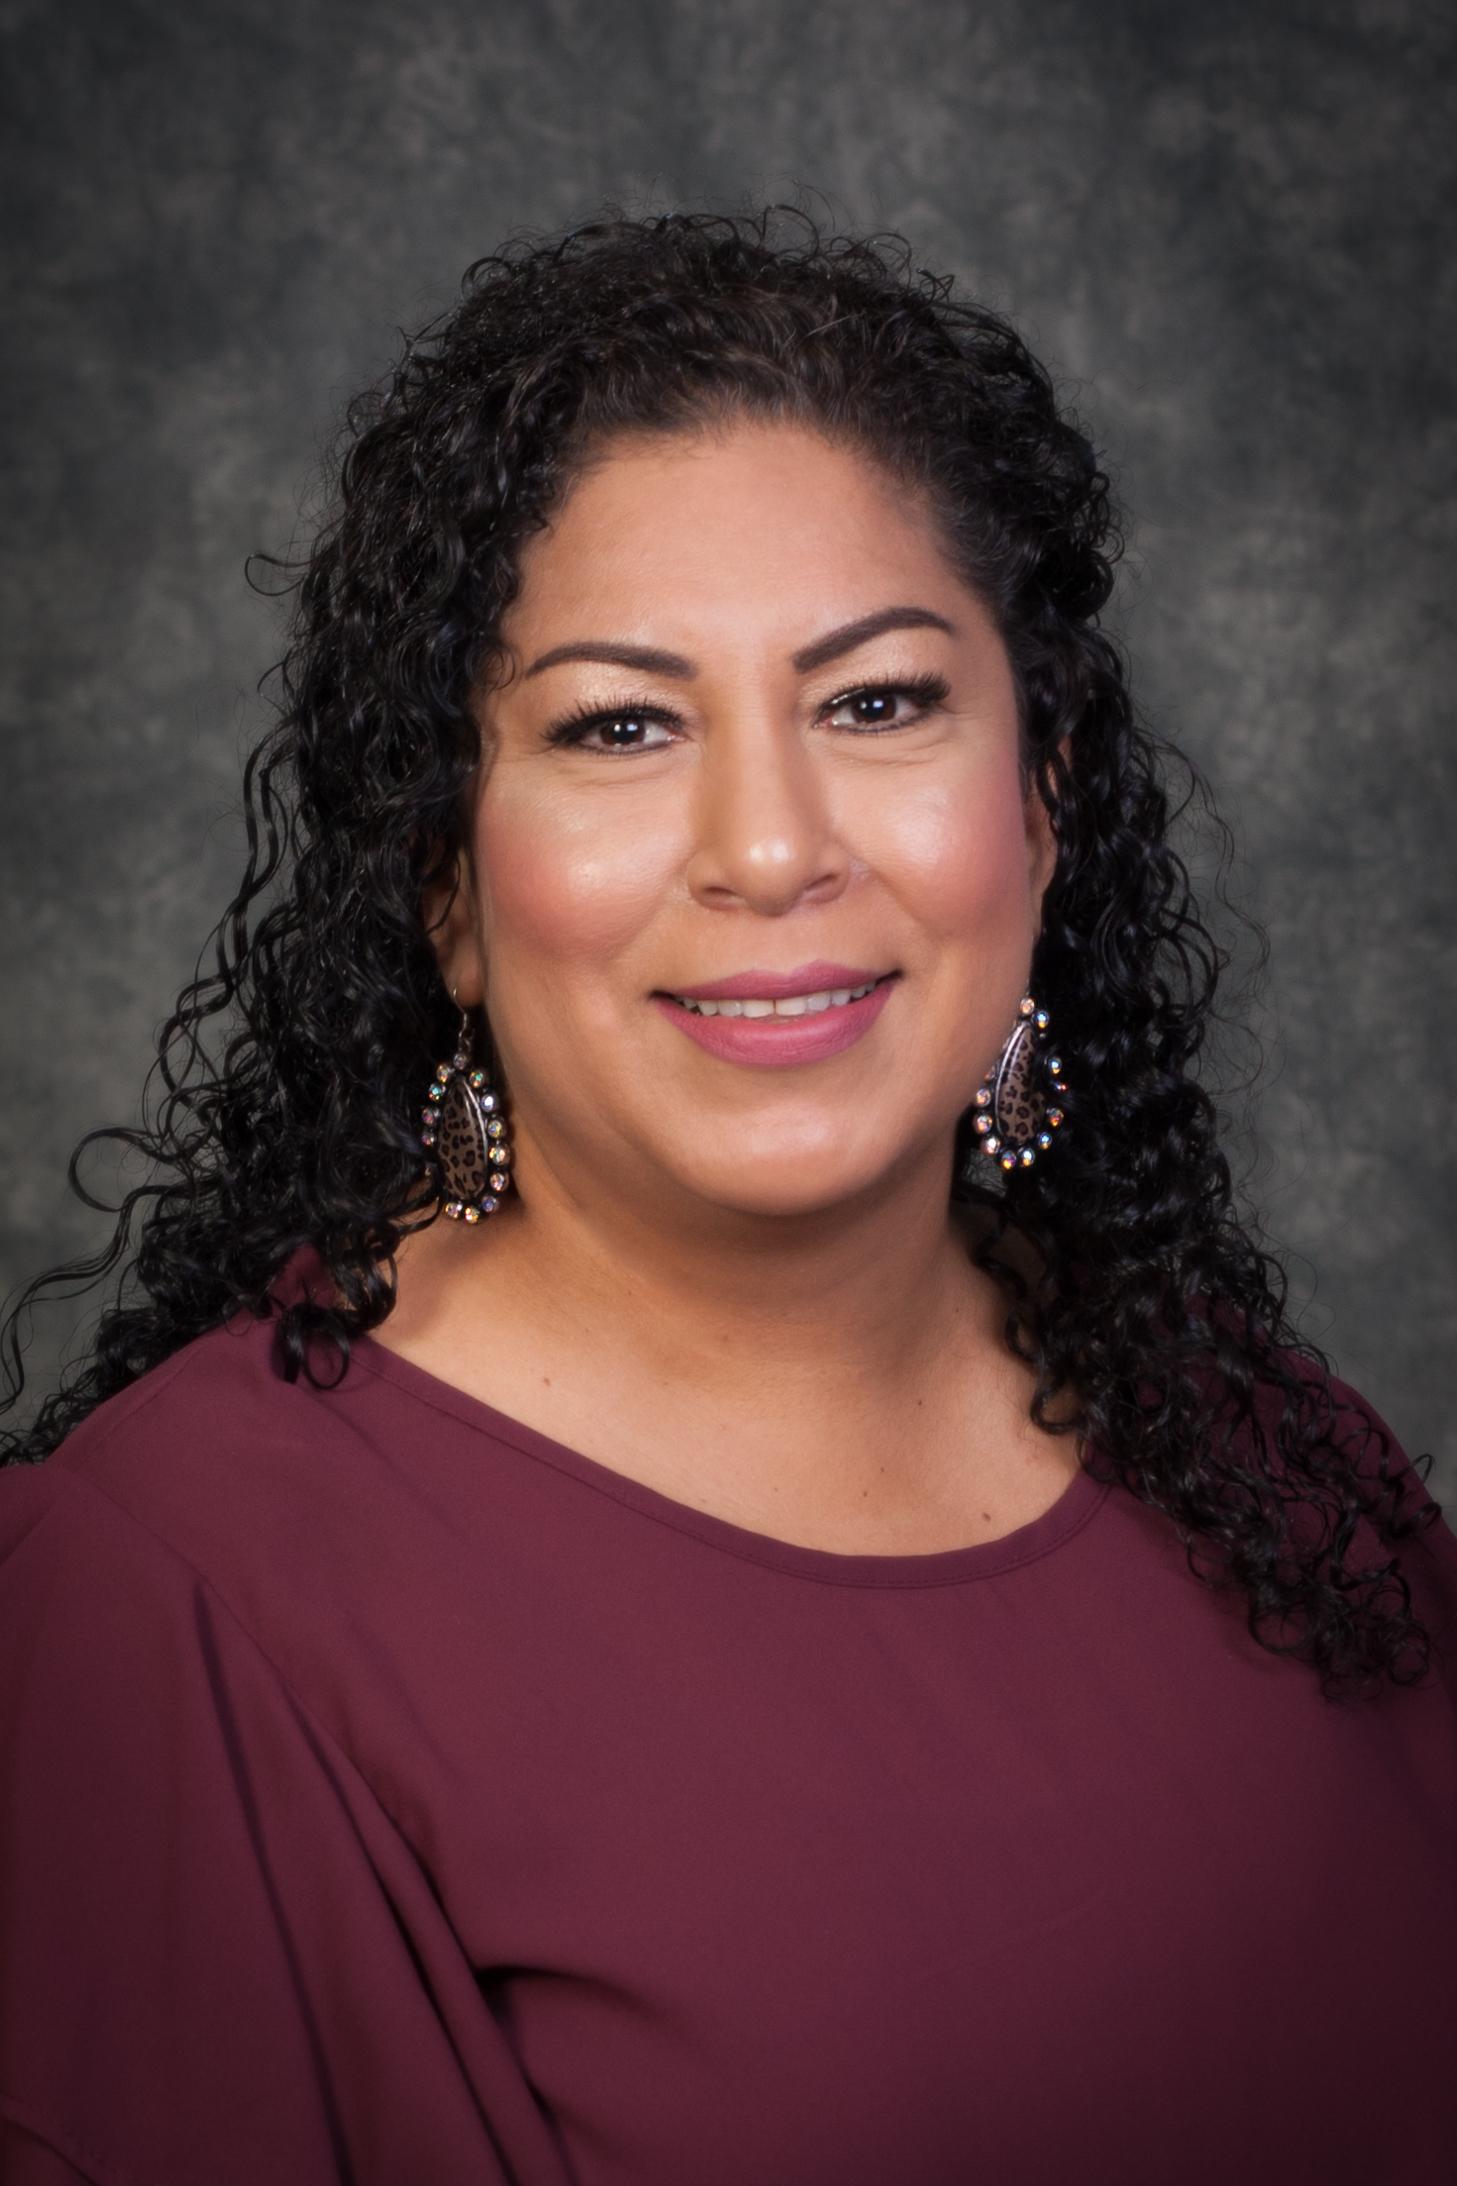 Marci Rodriguez